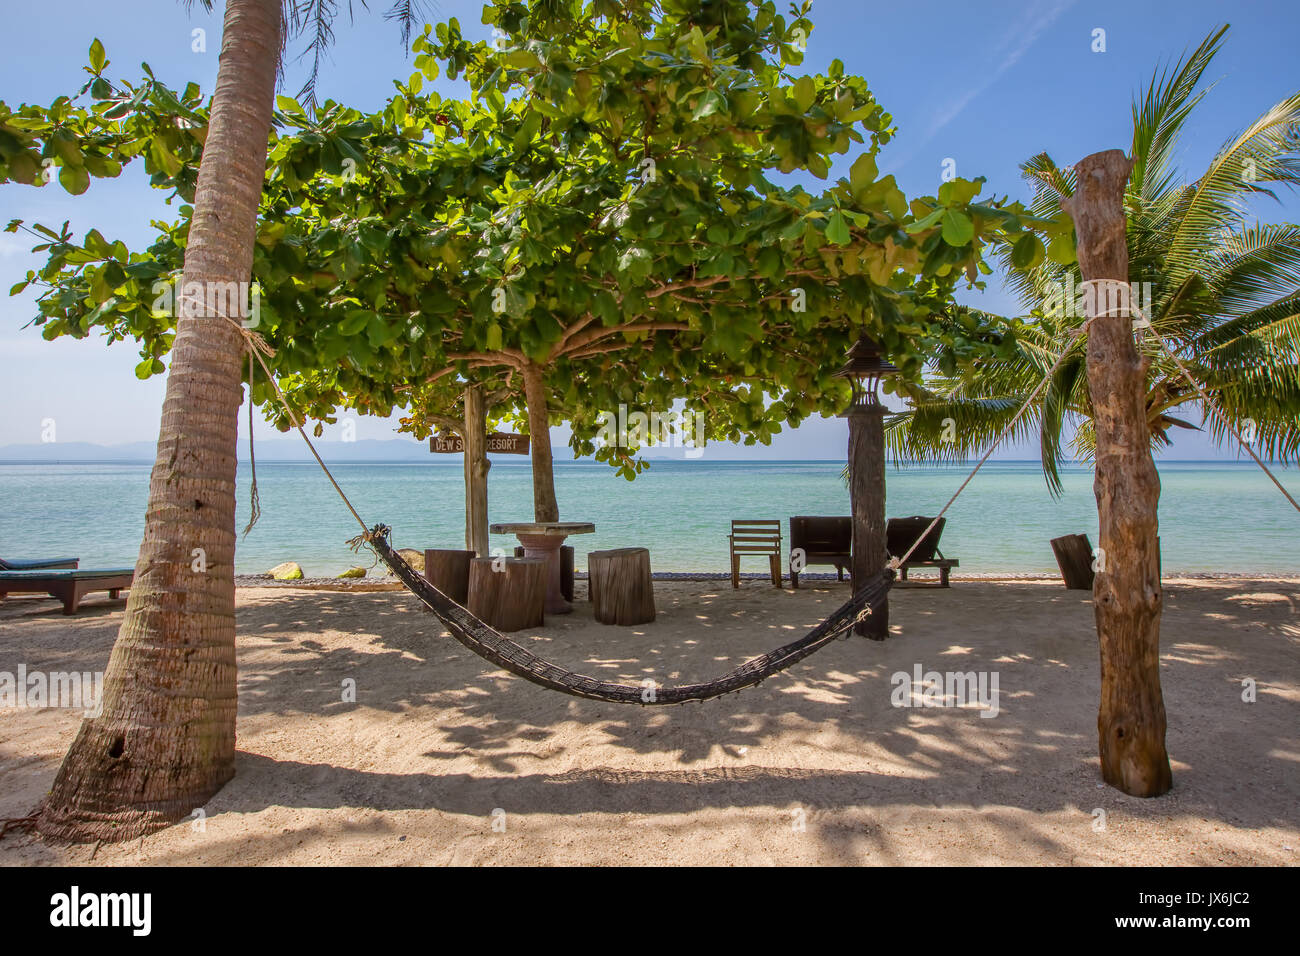 Baan Khai Beach, Koh Phangan, Thailand - Stock Image